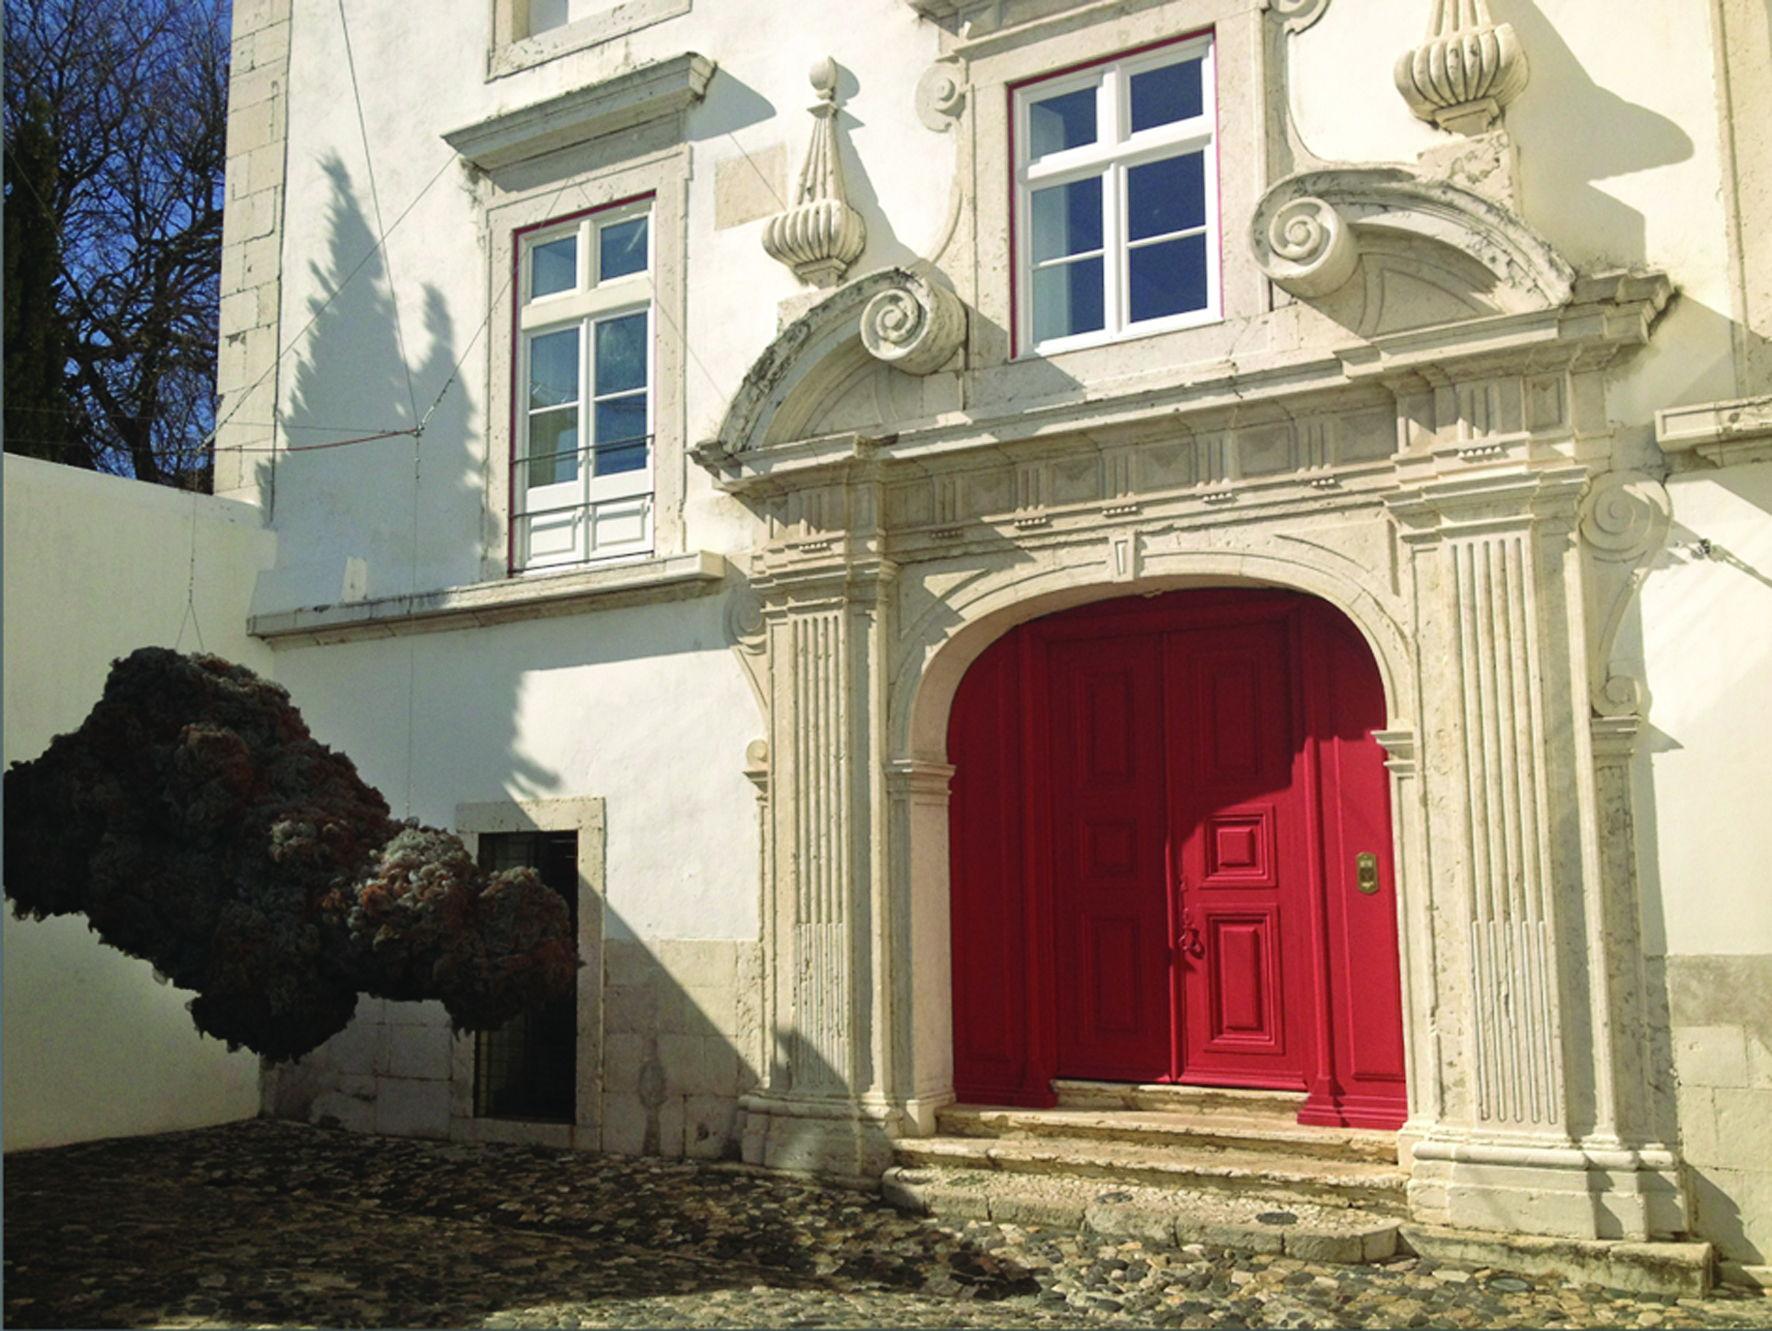 Palacio Belmonte Entrance - Camille de Ginestel #Lisbon #PalacioBelmonte #LuxuryHotels #TravelPortugal